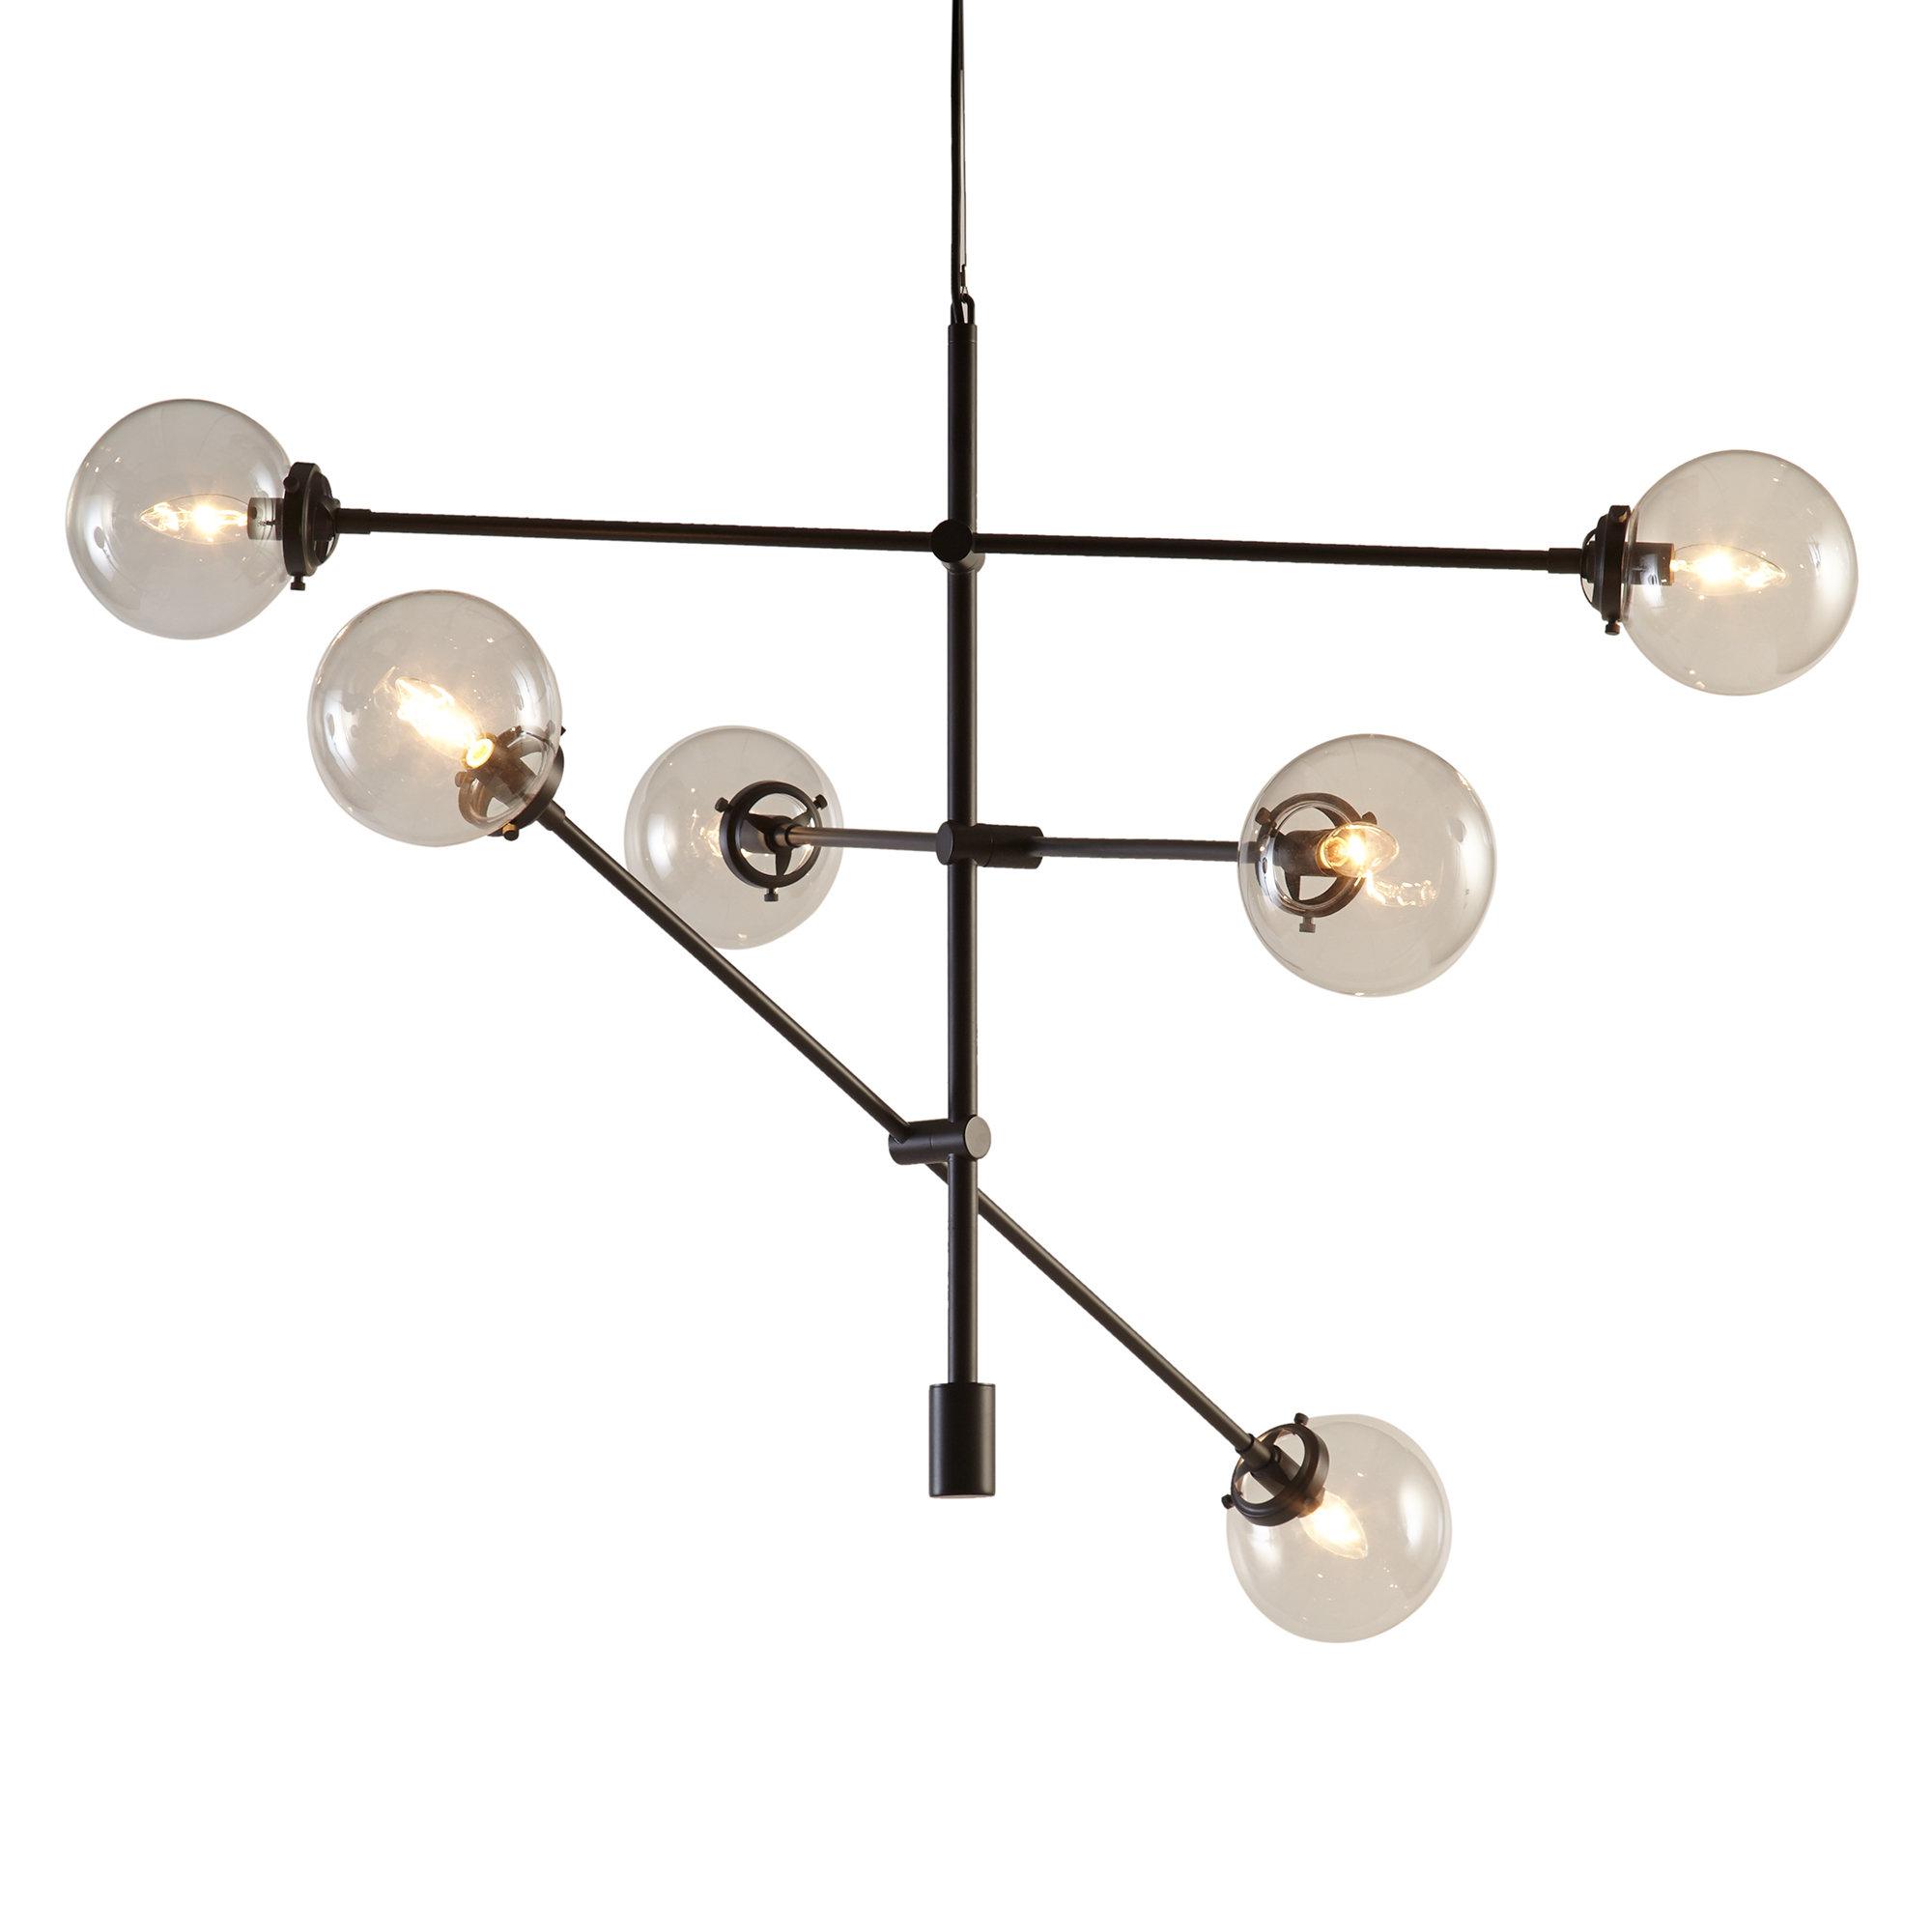 Latest Bailey Antique 6 Light Sputnik Chandelier Intended For Eladia 6 Light Sputnik Chandeliers (View 6 of 25)